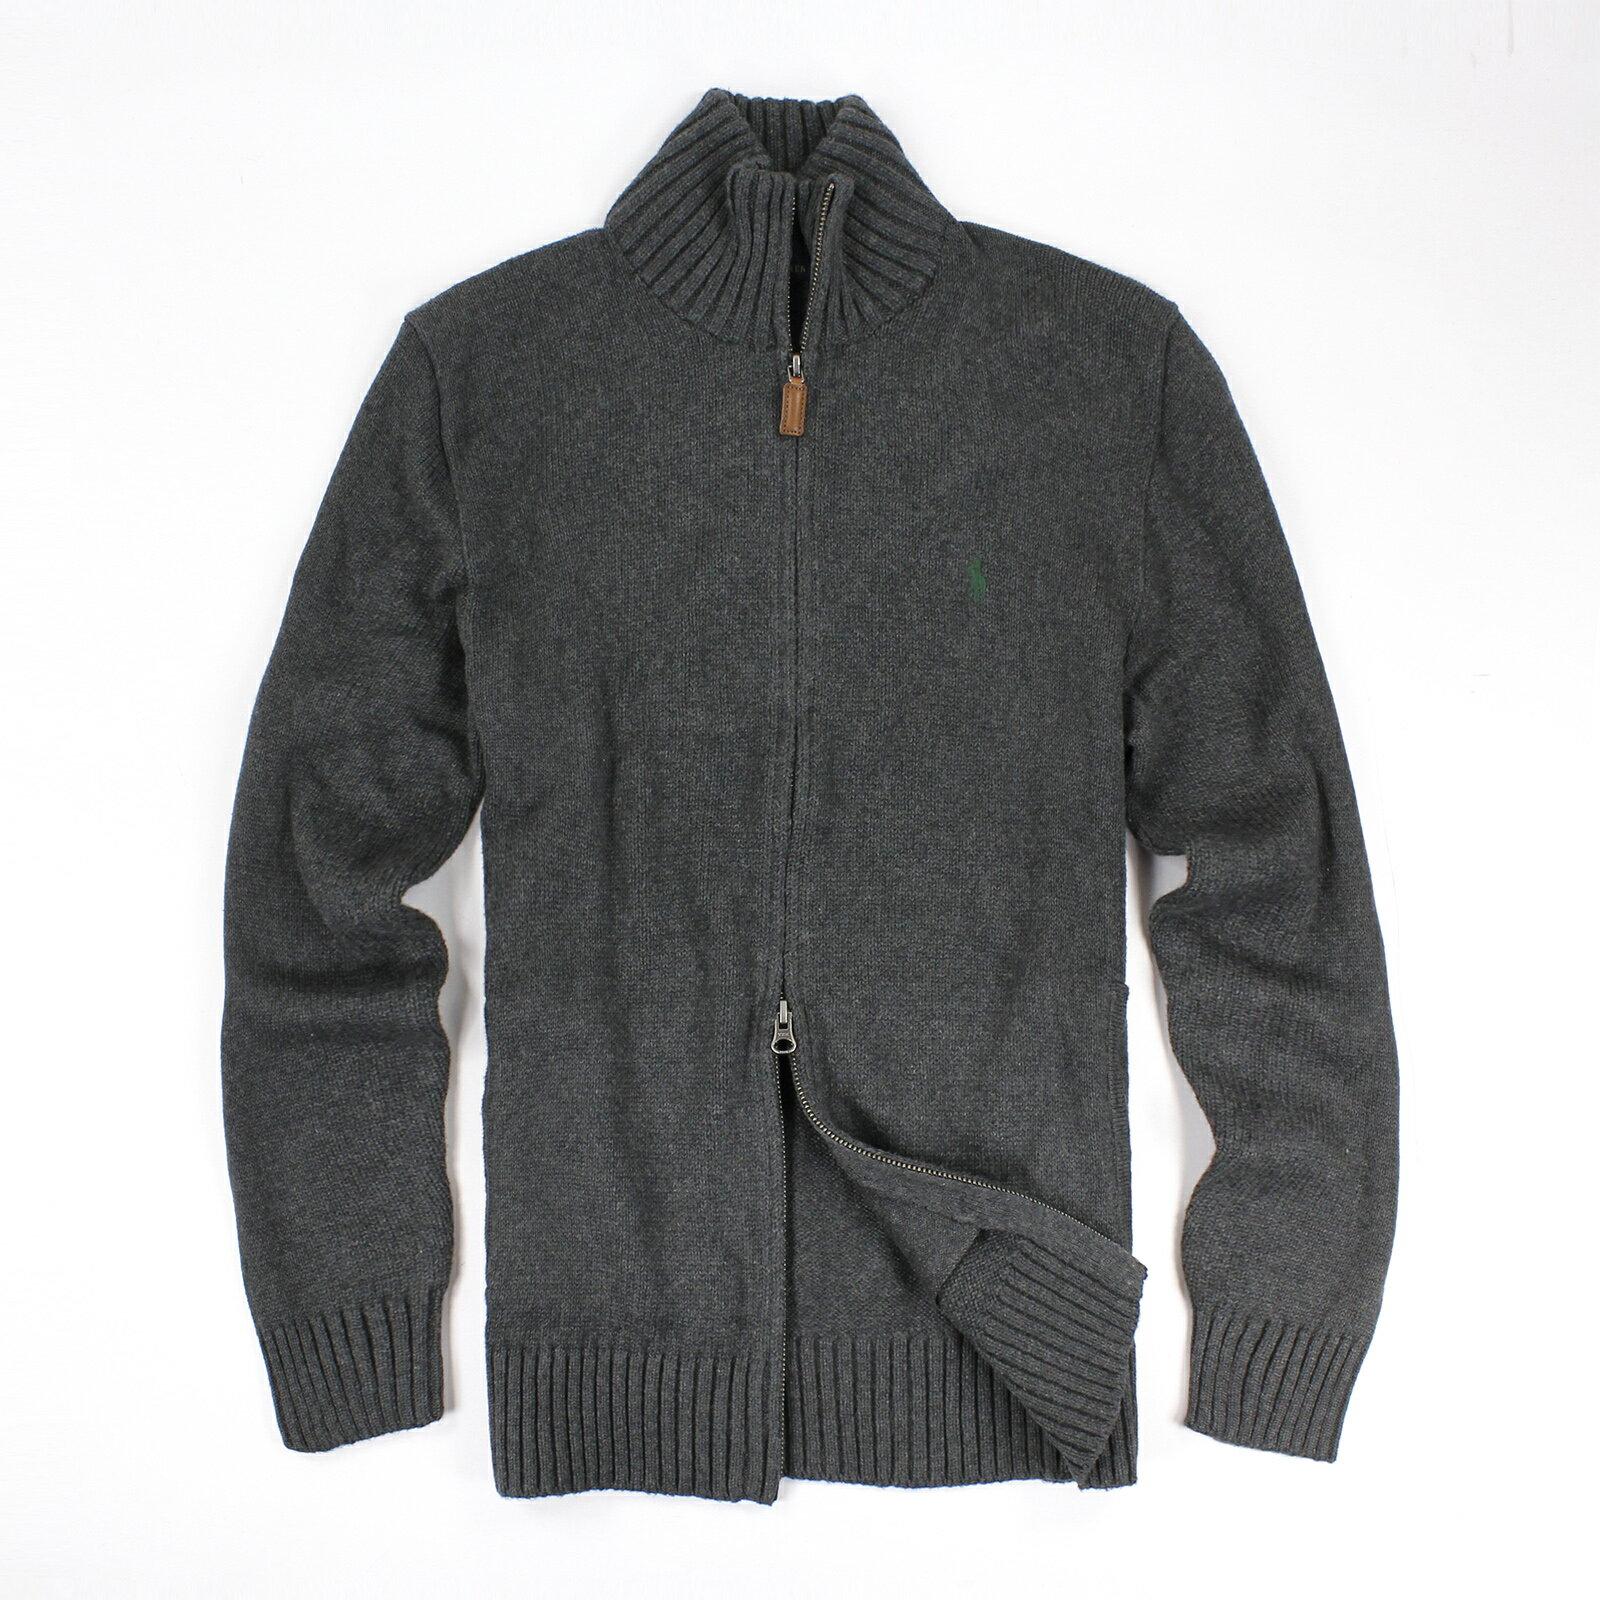 美國百分百~ ~Ralph Lauren 針織衫 RL 線衫 夾克 Polo 小馬 深灰